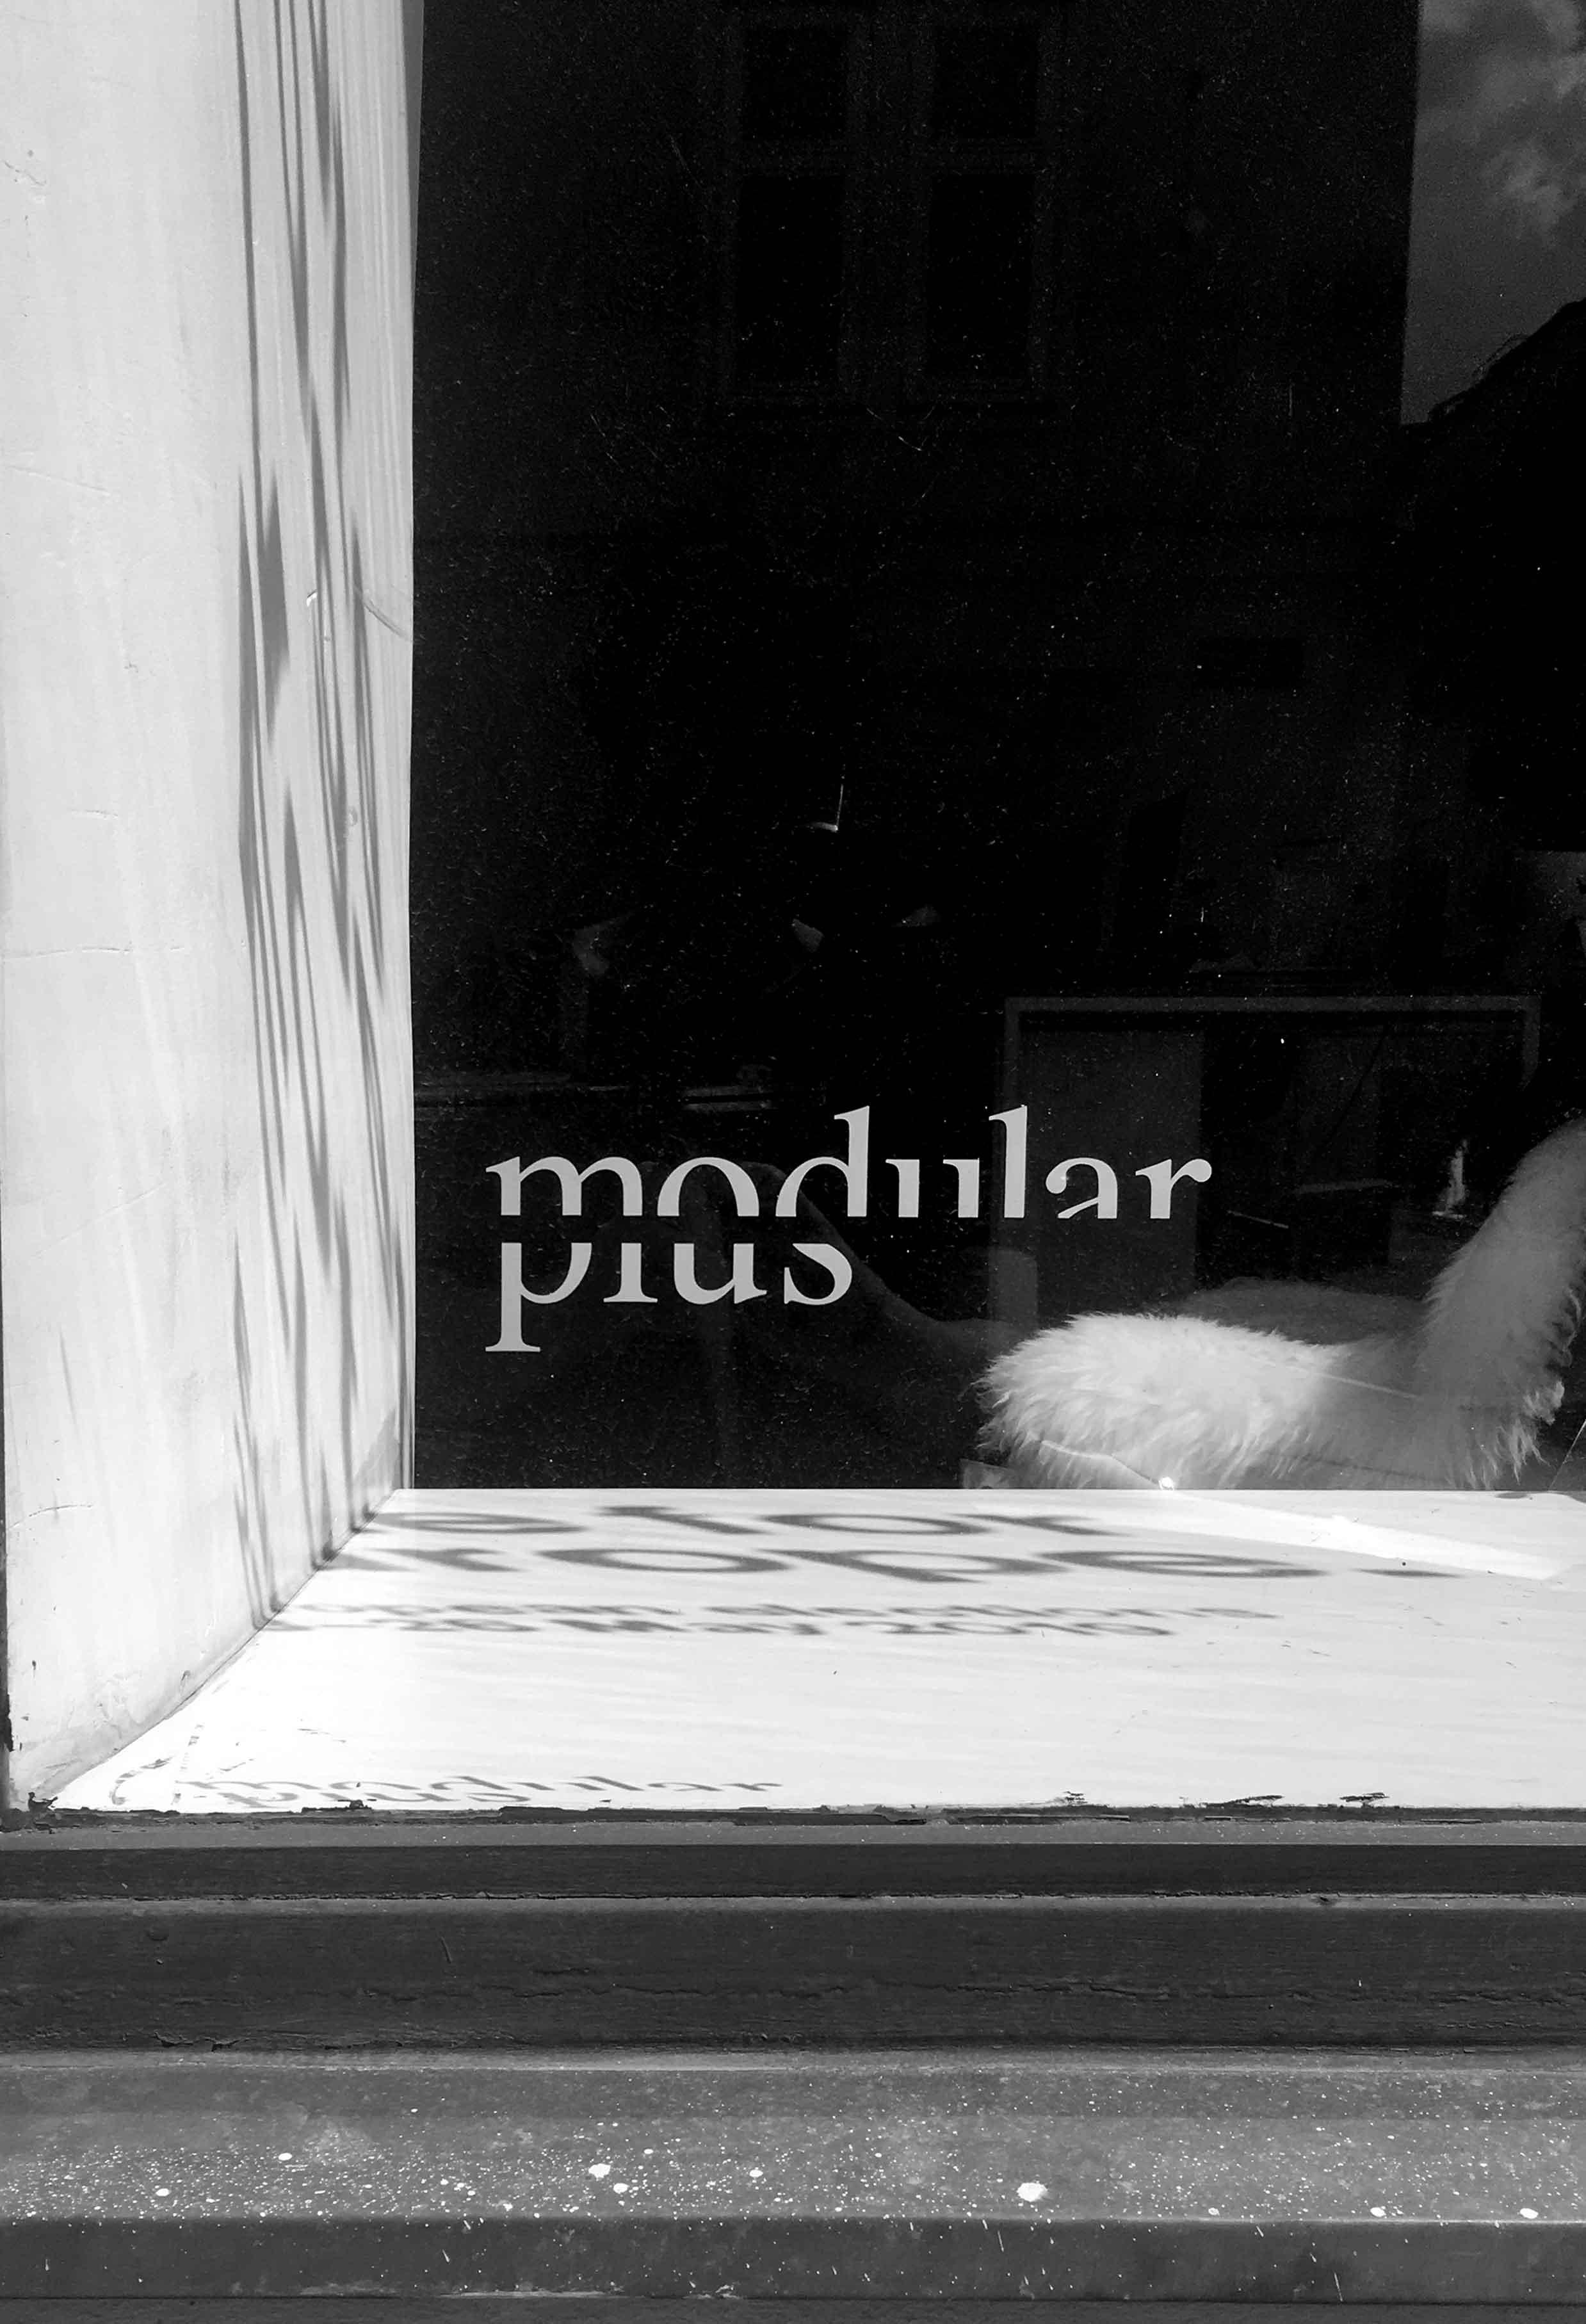 modularplus2